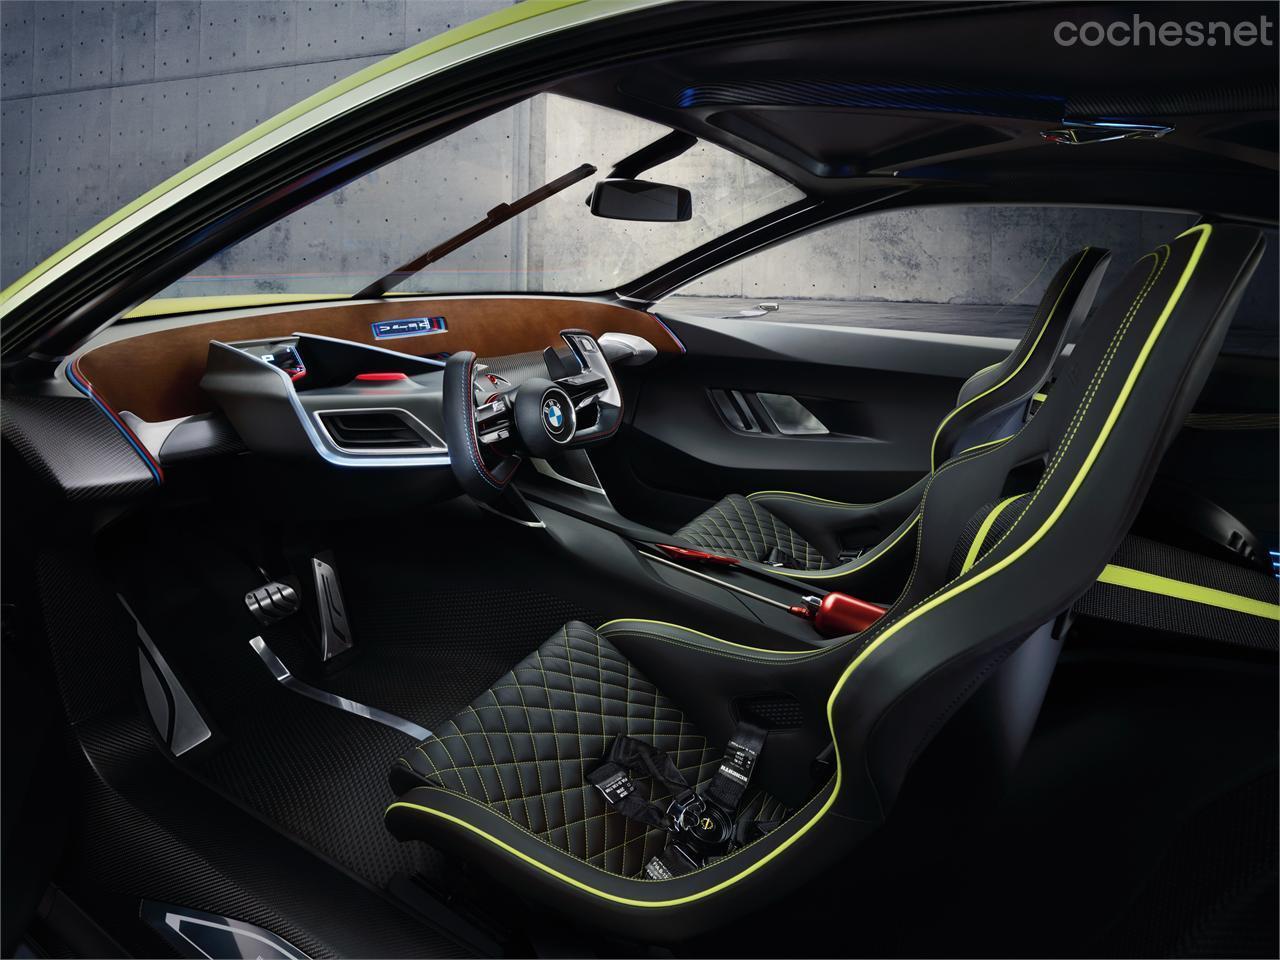 BMW 3.0 CSL Hommage Concept - foto 5